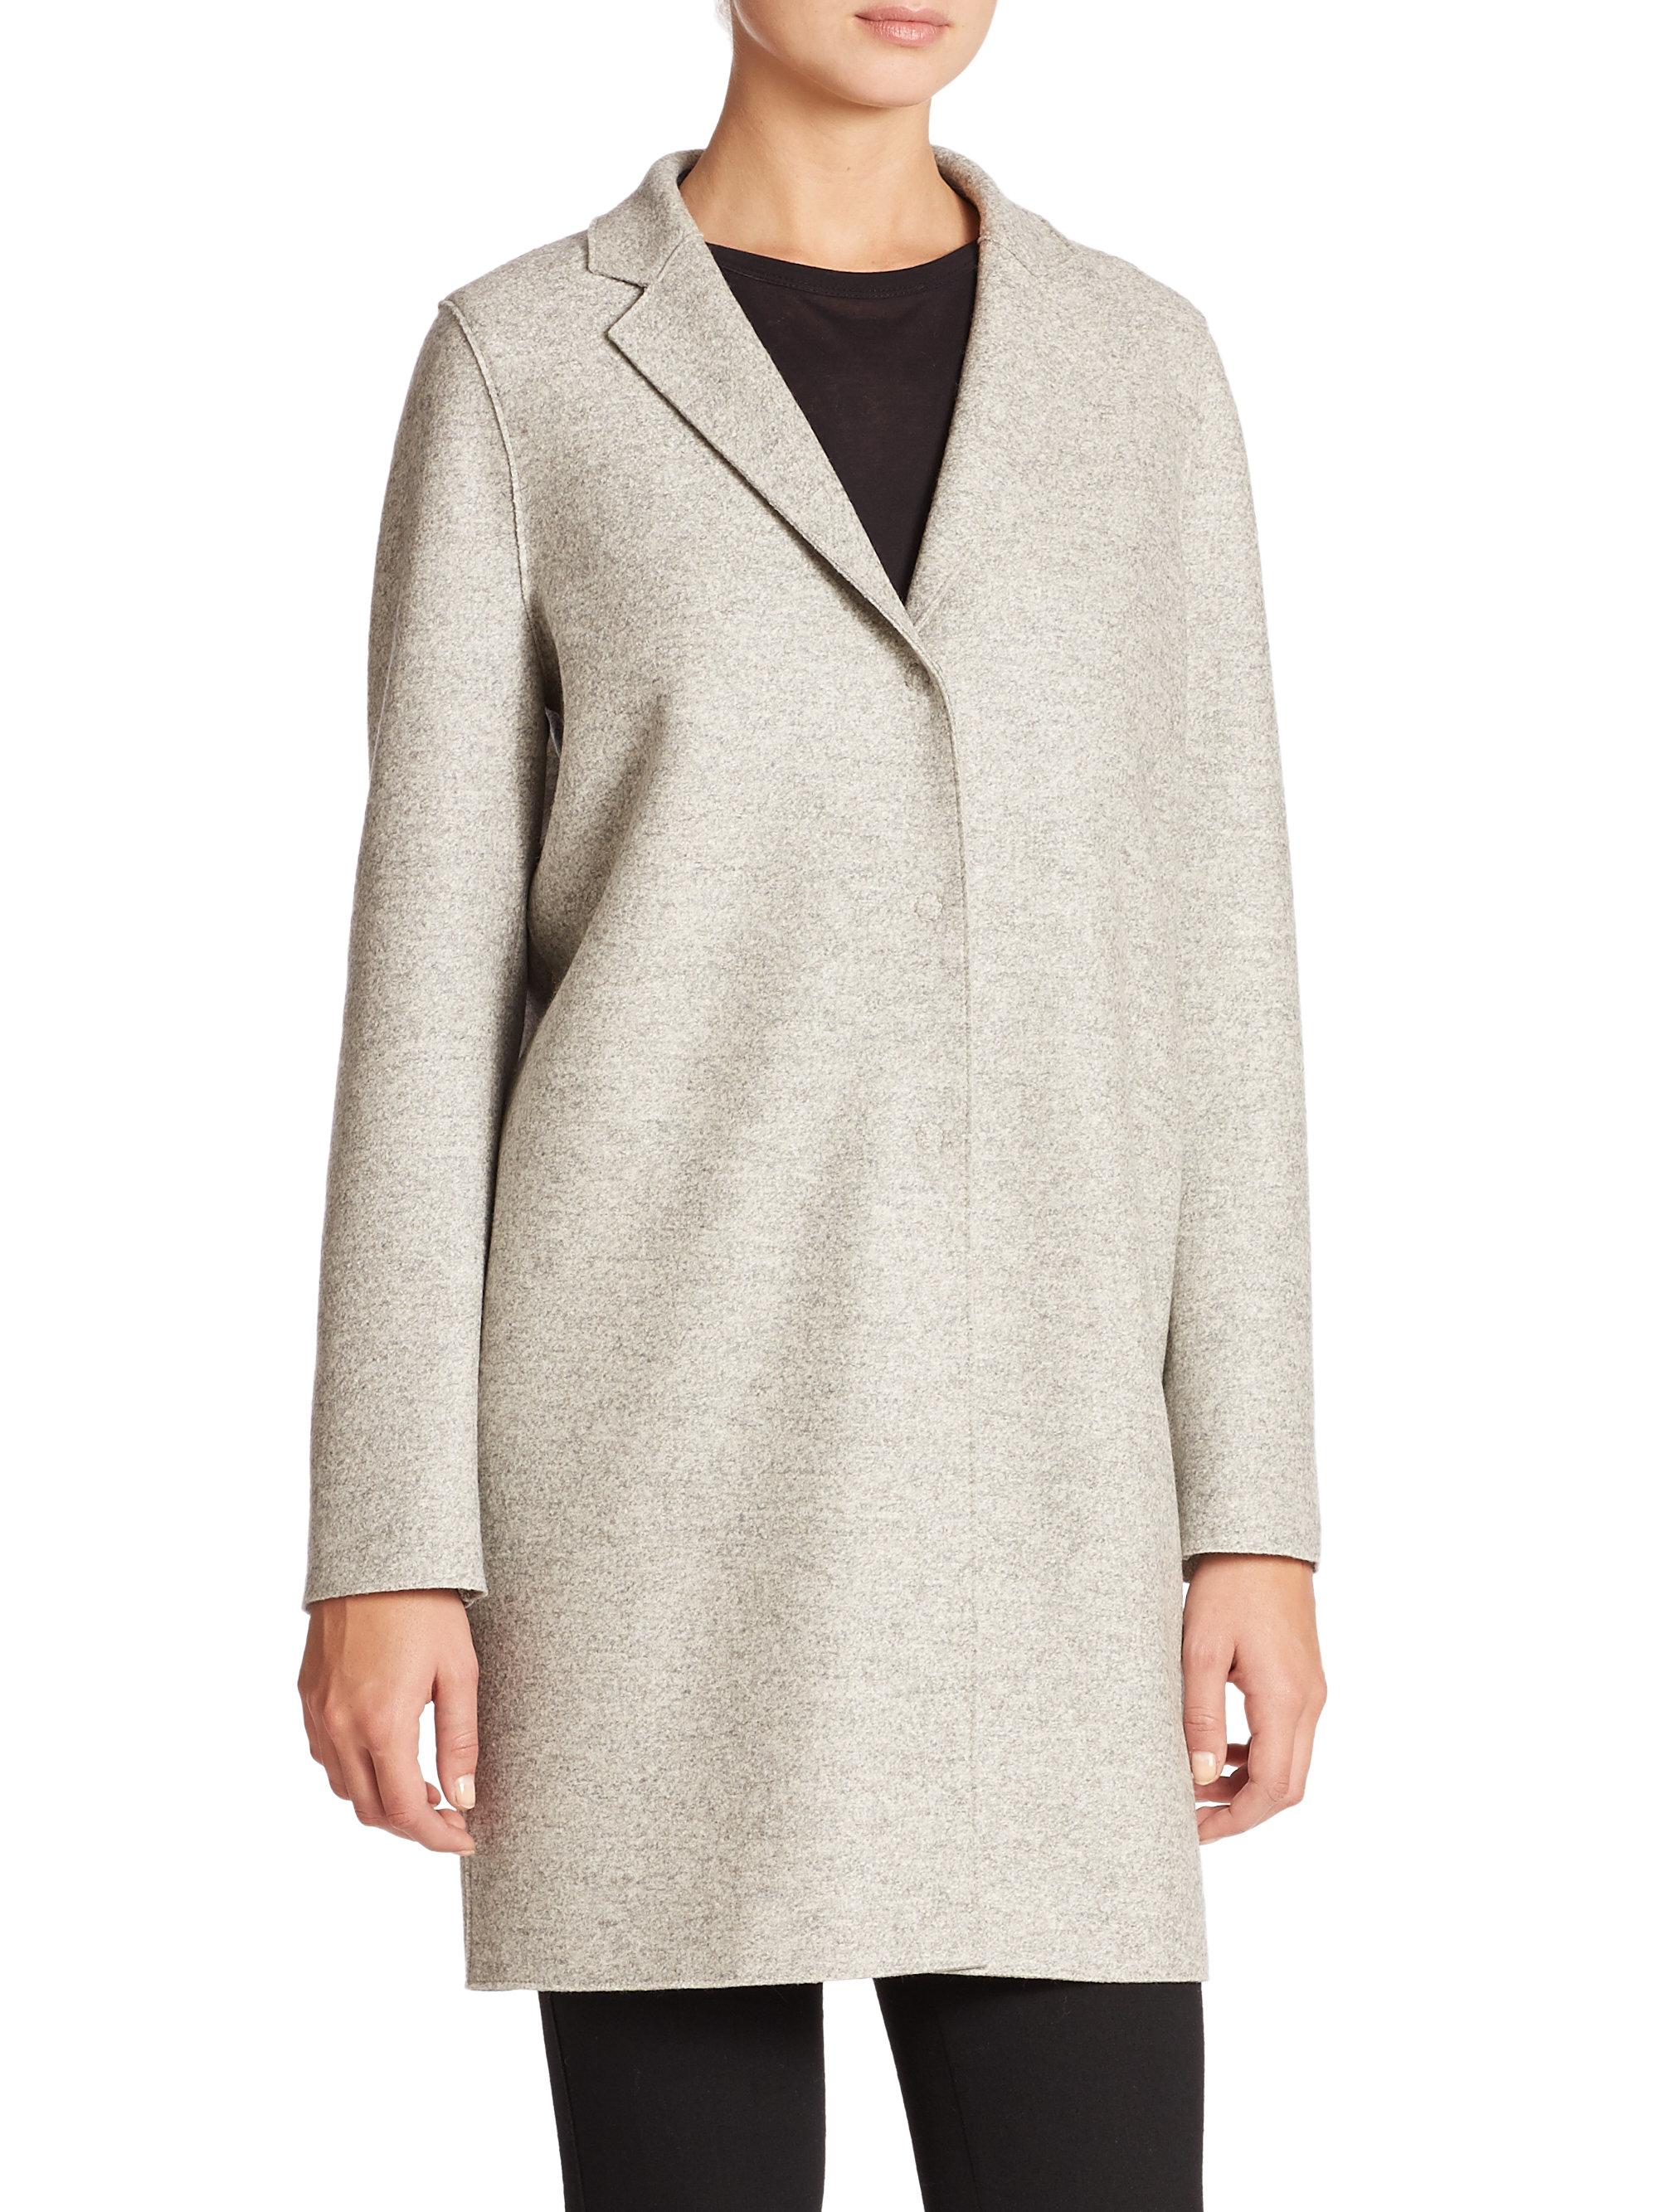 harris wharf london wool cocoon coat in gray ash moulin lyst. Black Bedroom Furniture Sets. Home Design Ideas